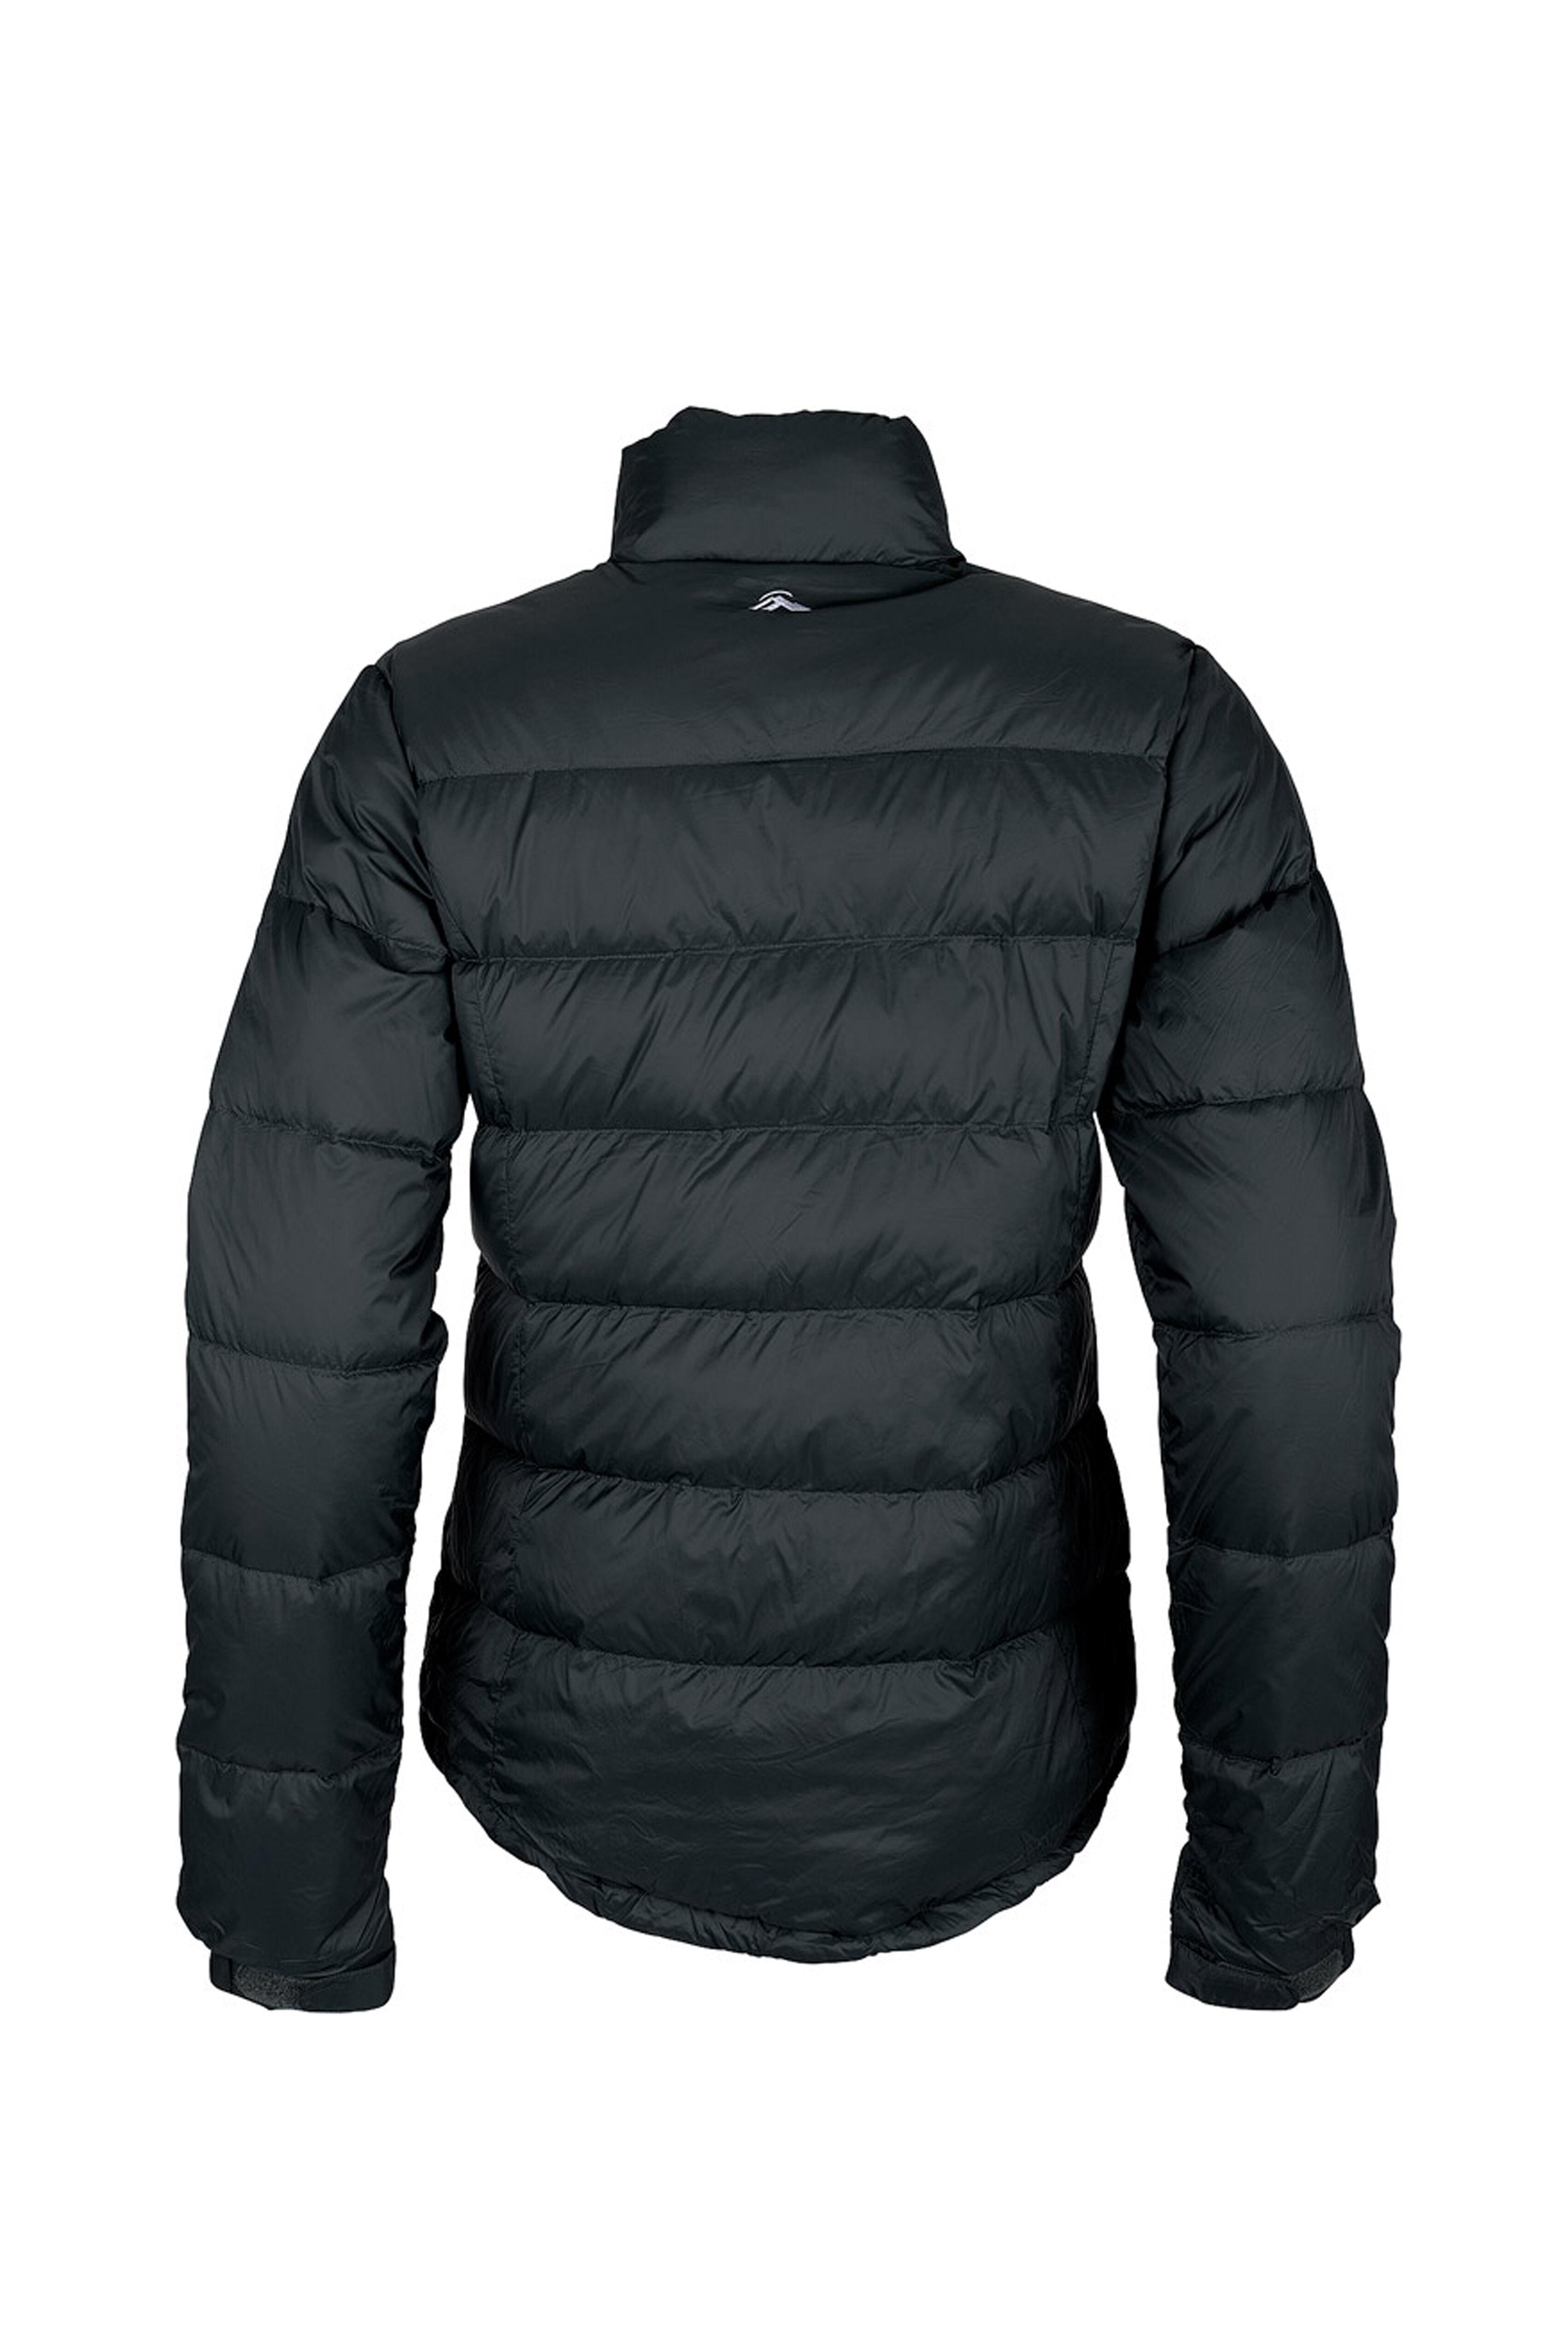 Men's Clothing Jackets & Coats Brave 2016 Hot Parka Men Mens Down Coat Winter Down Jacket White Duck Down Fur Collar